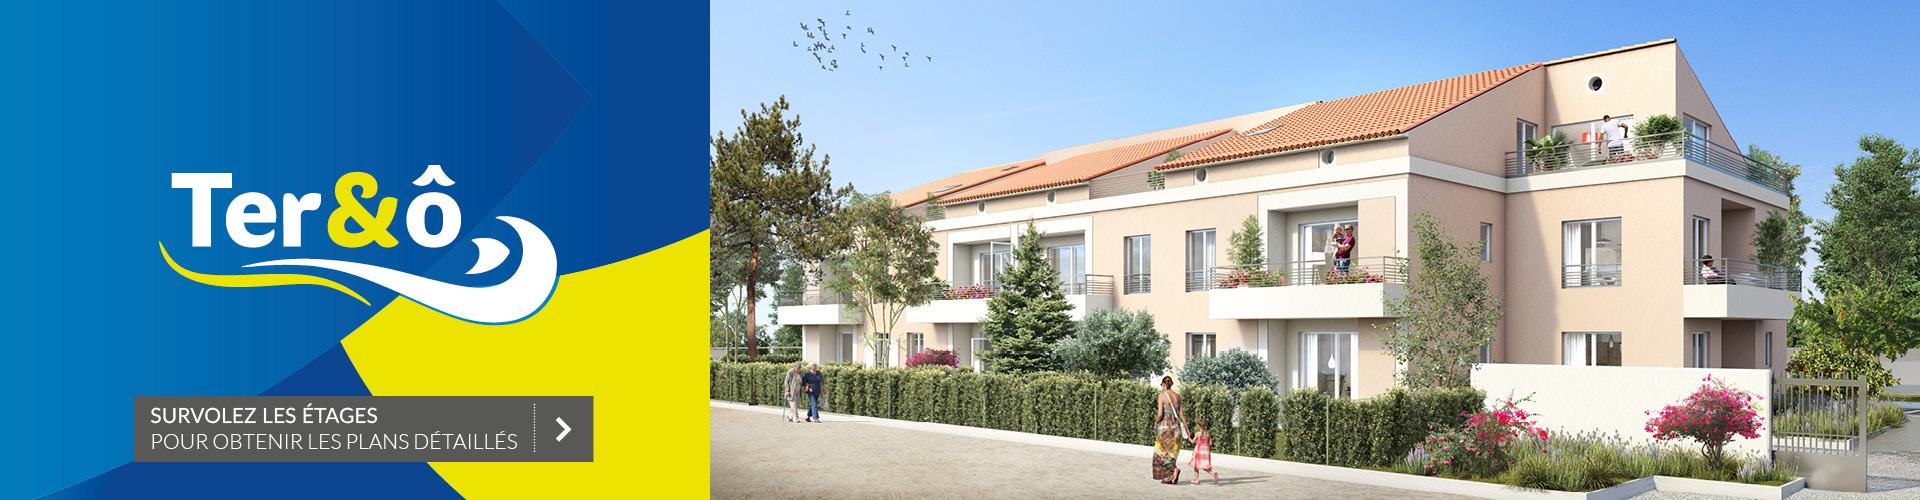 Résidence immobilière Ter&O - La Garde - Var - 83